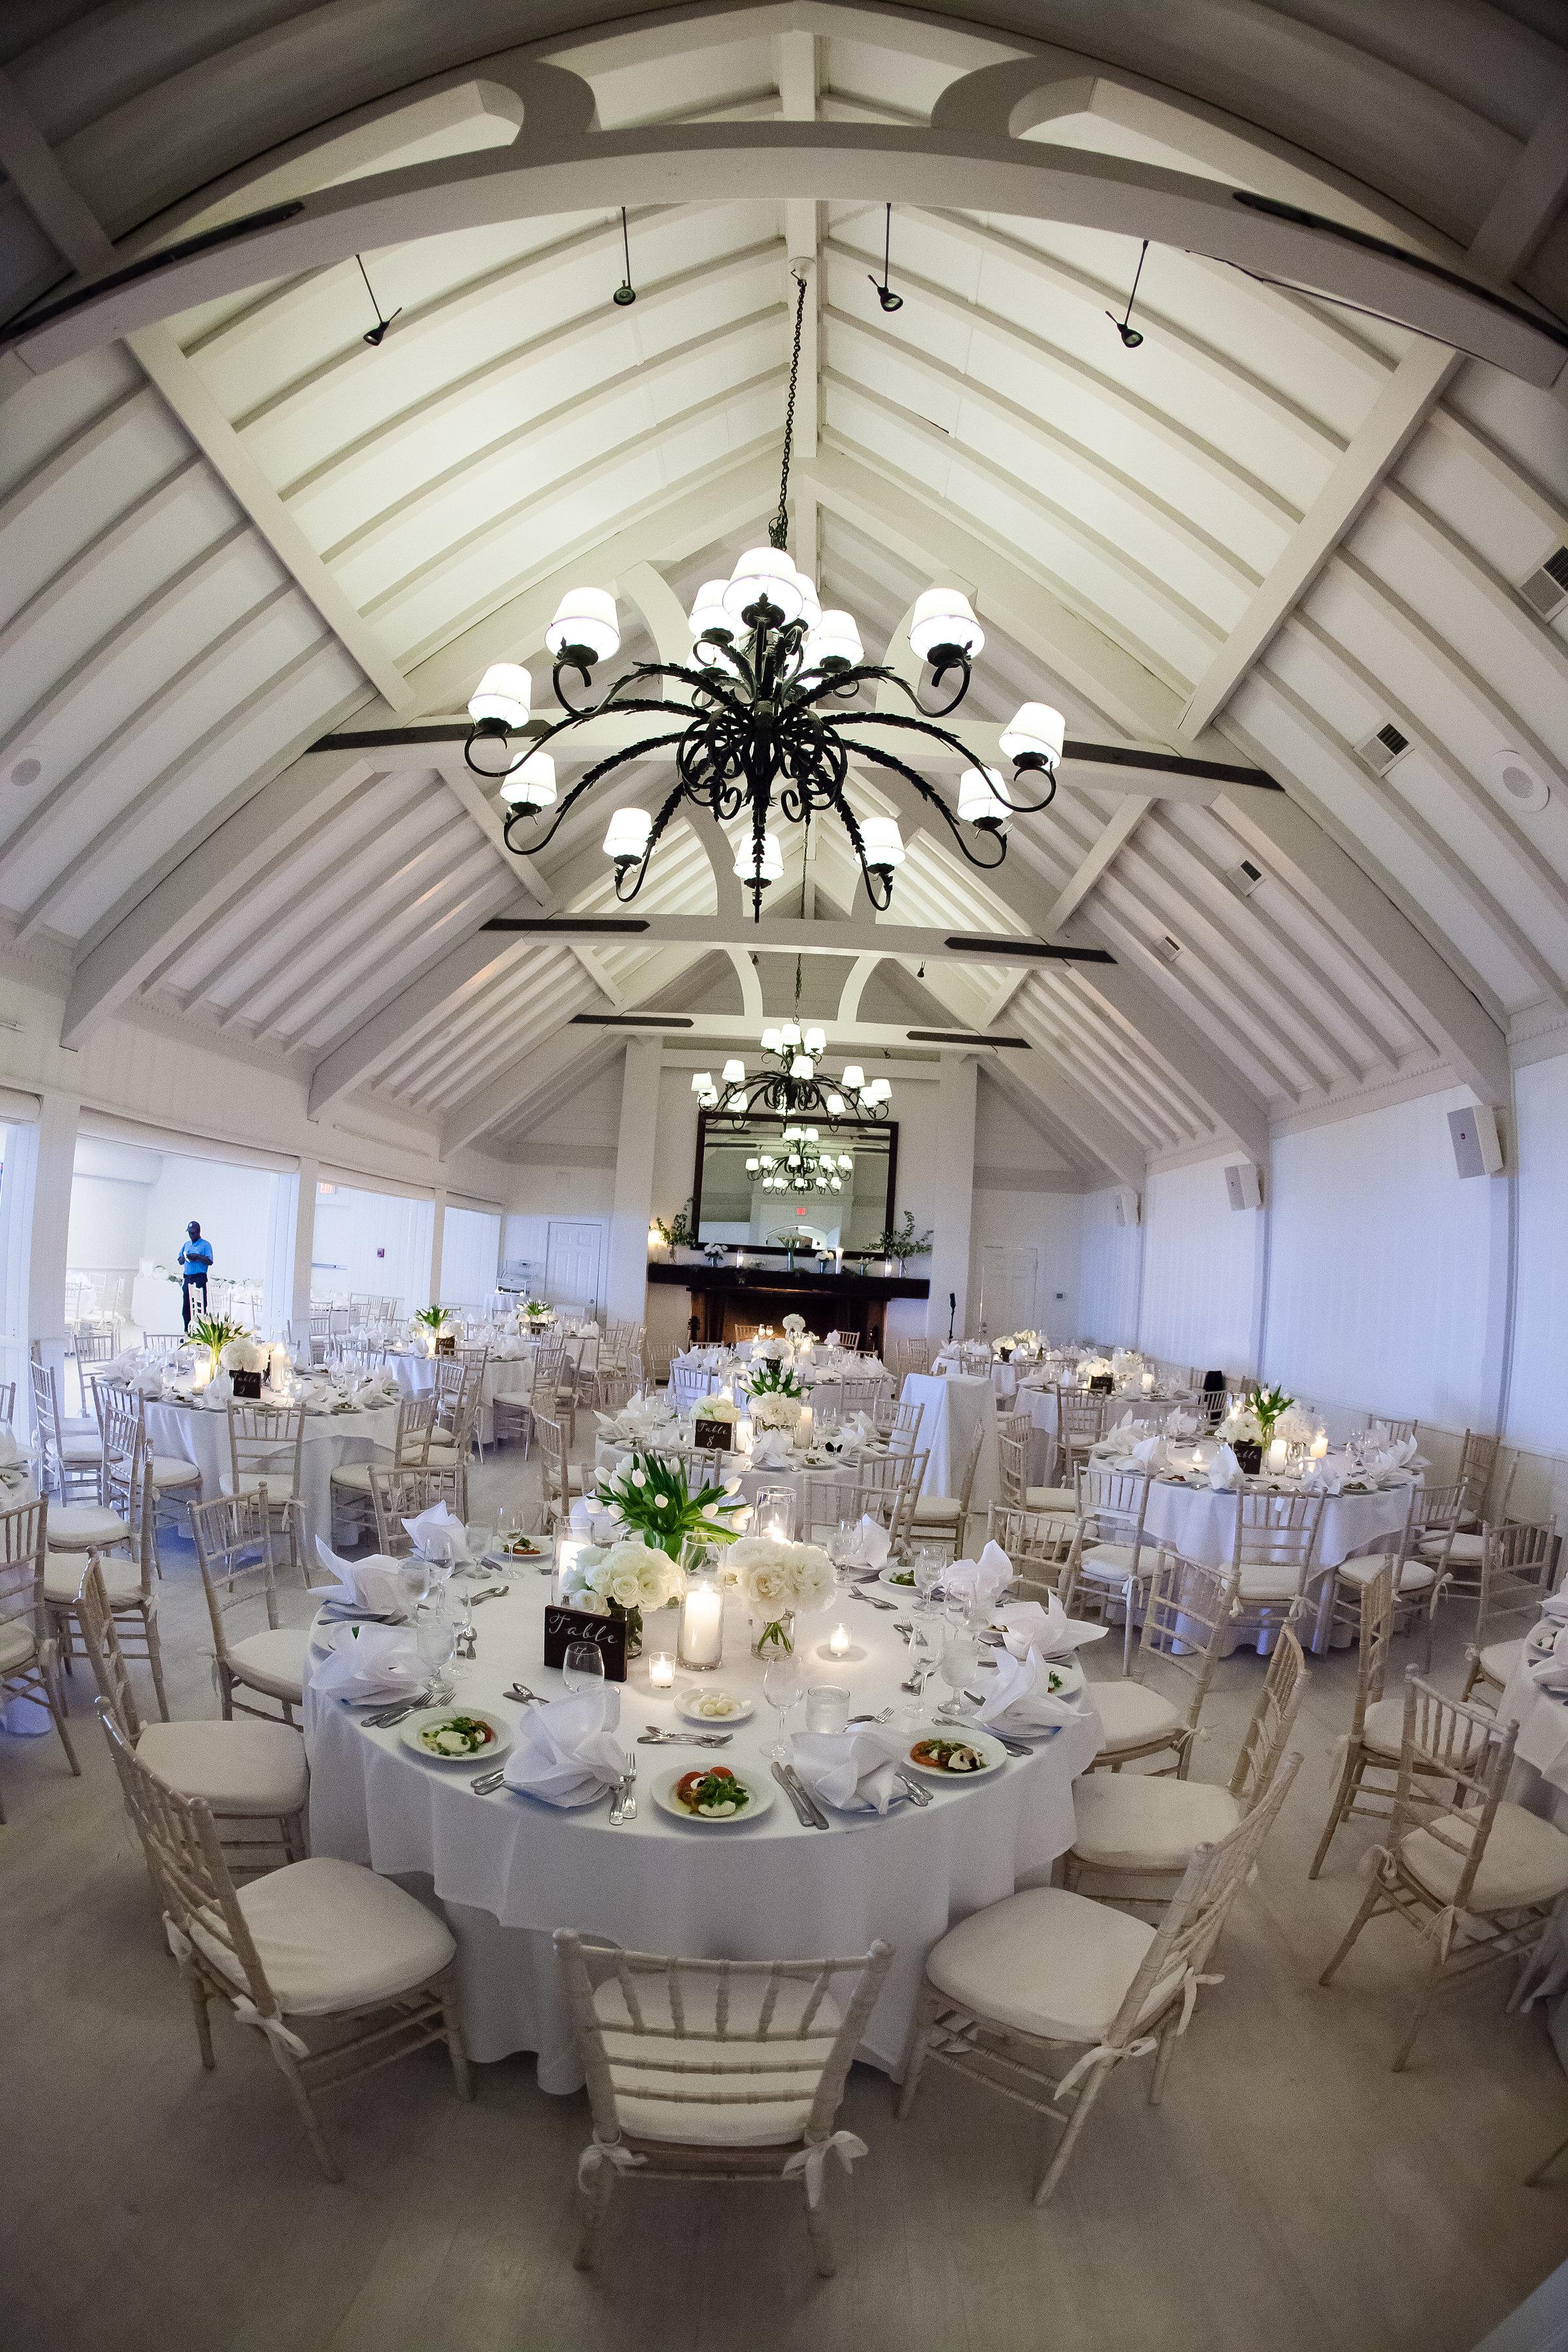 4-eyes-photography-montauk-yacht-club-wedding-1489.jpg